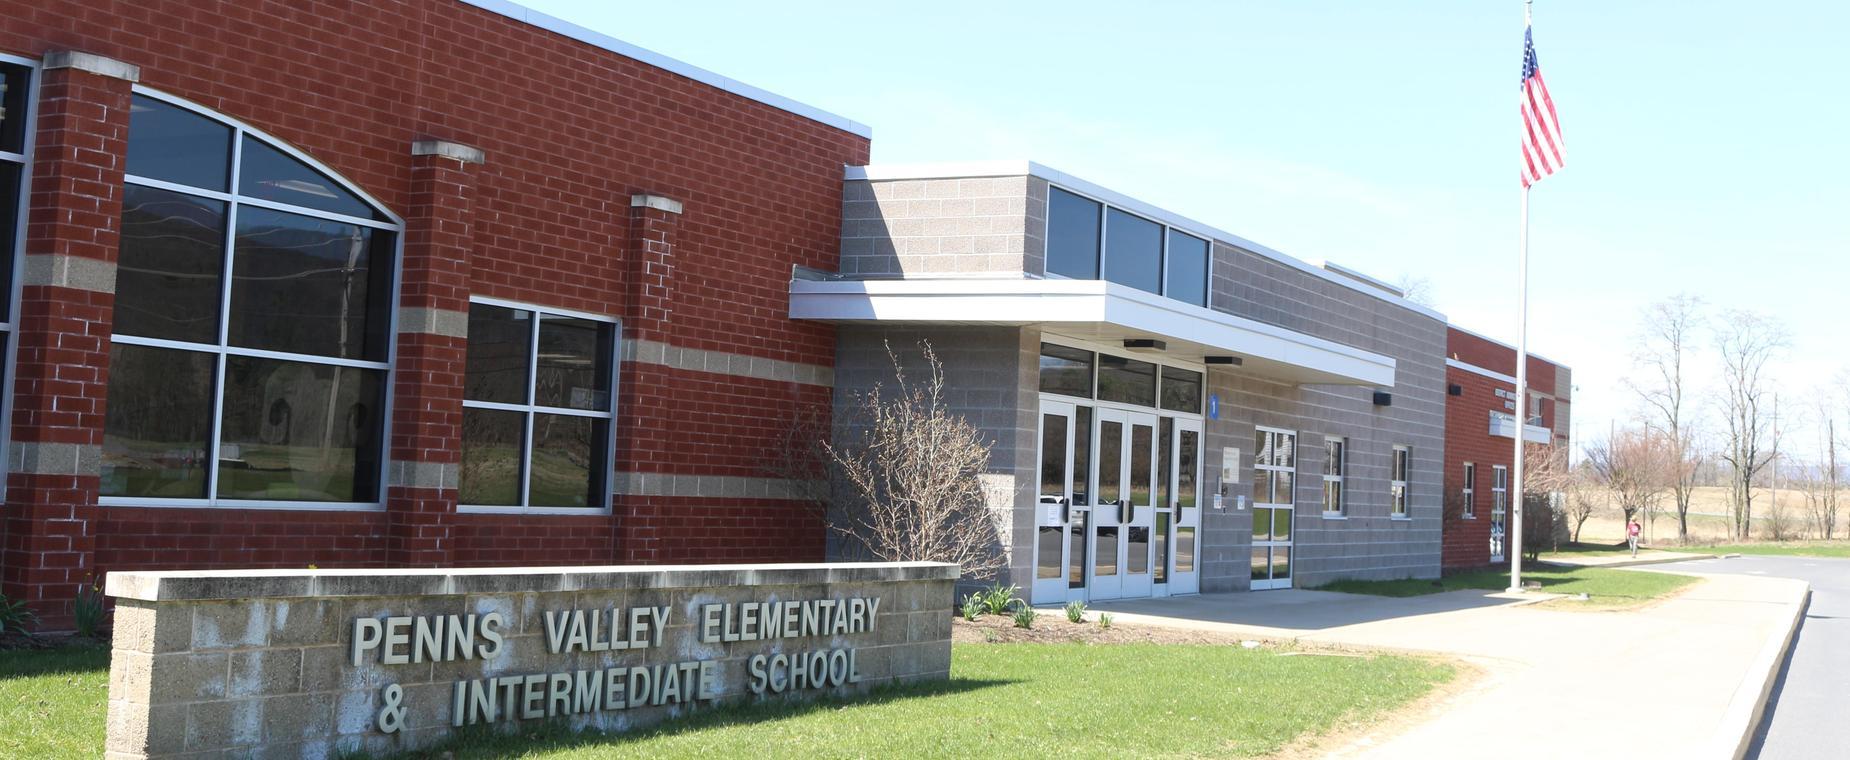 Penns Valley Elementary and Intermediate School